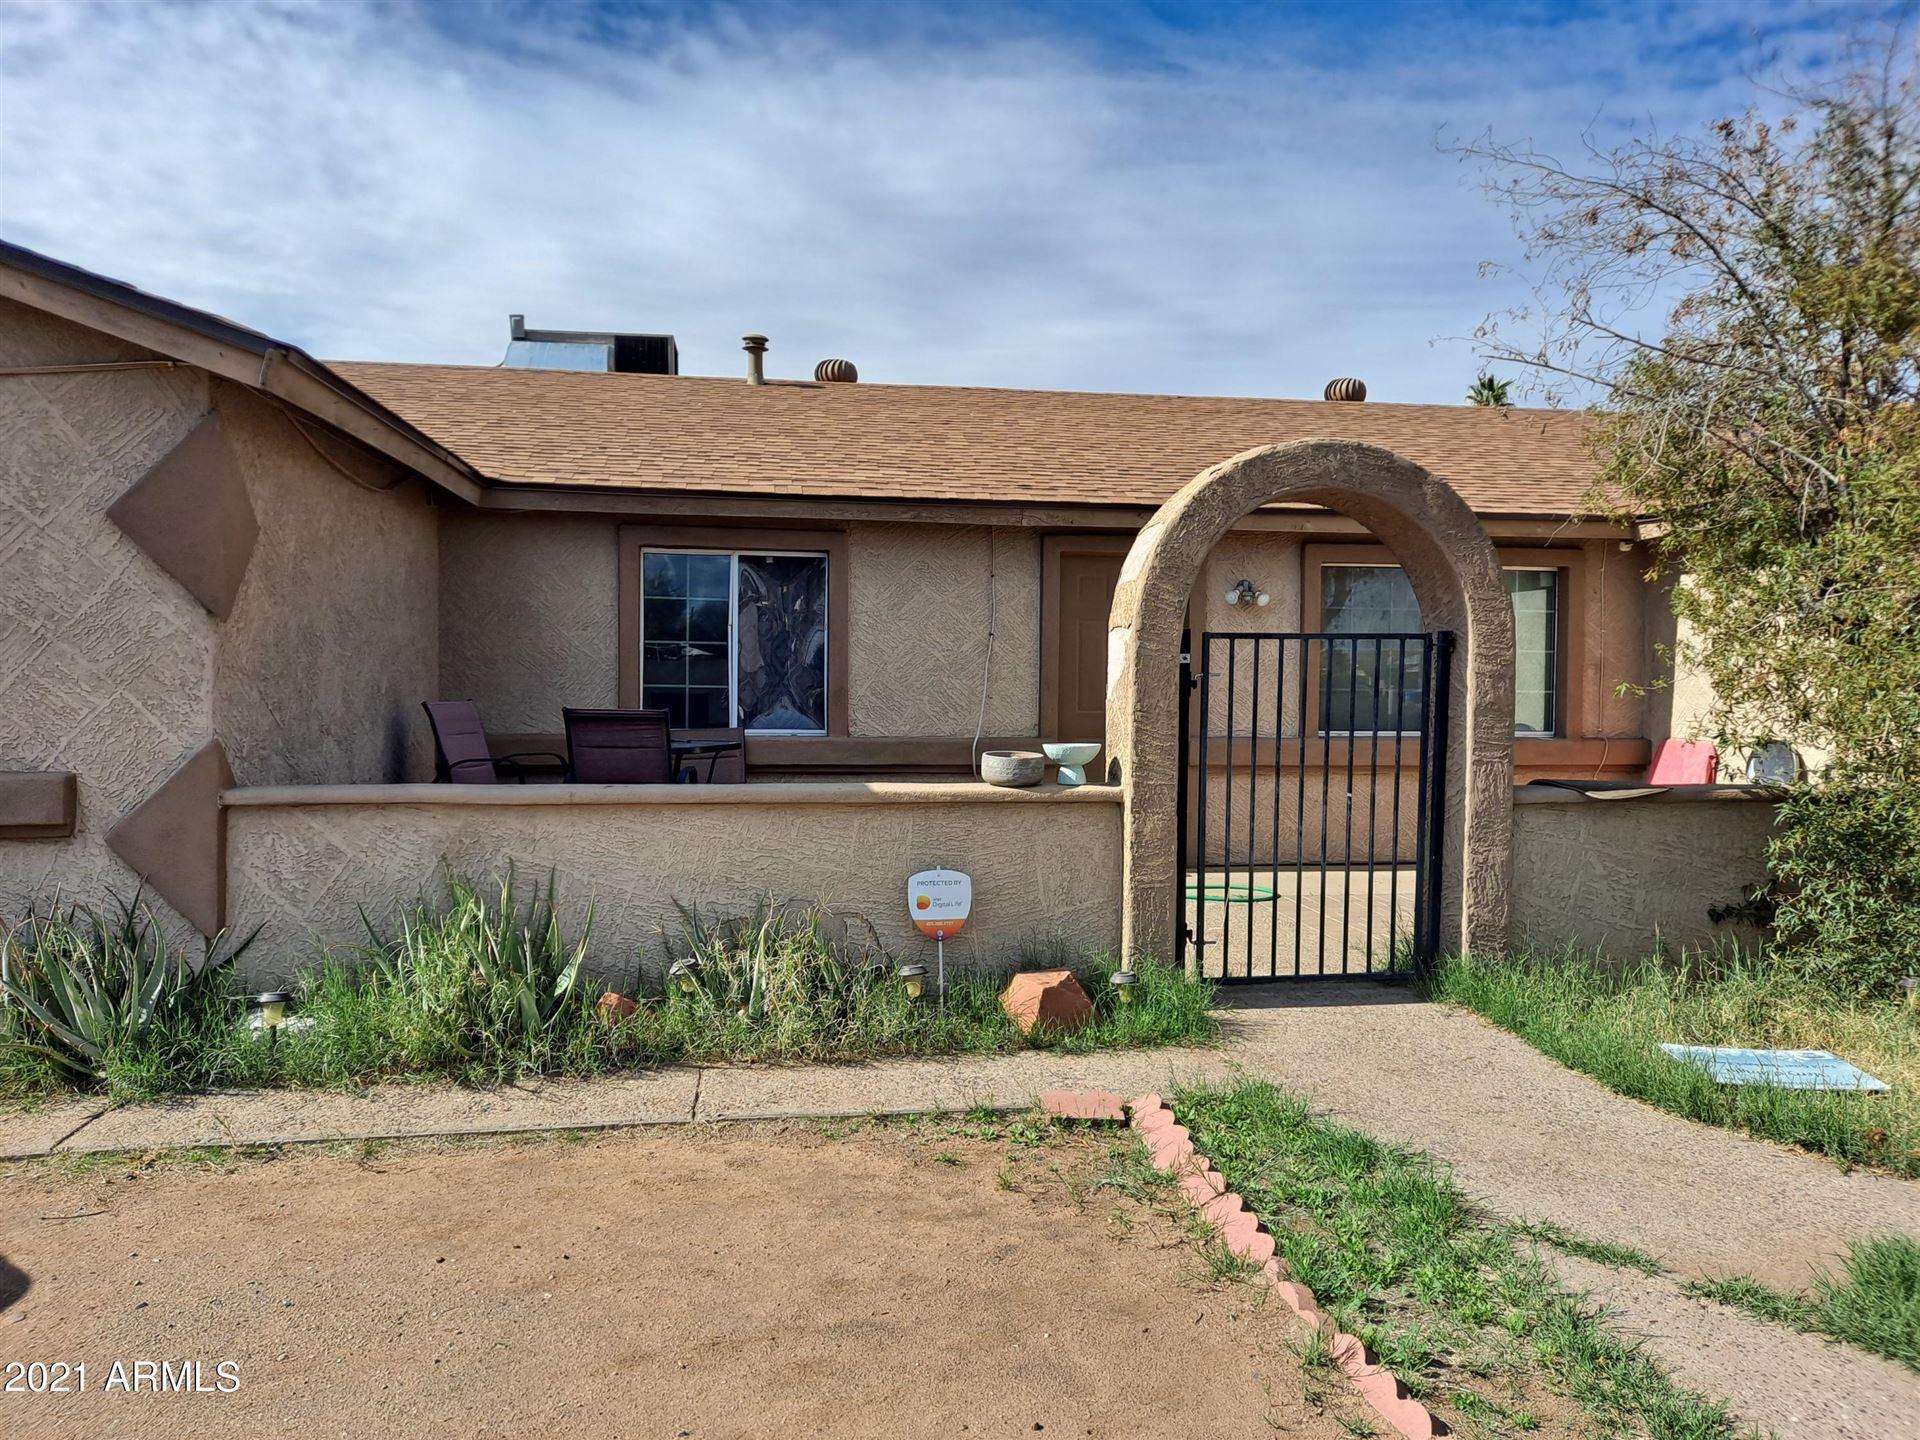 Photo of 2004 N 61ST Avenue, Phoenix, AZ 85035 (MLS # 6189407)